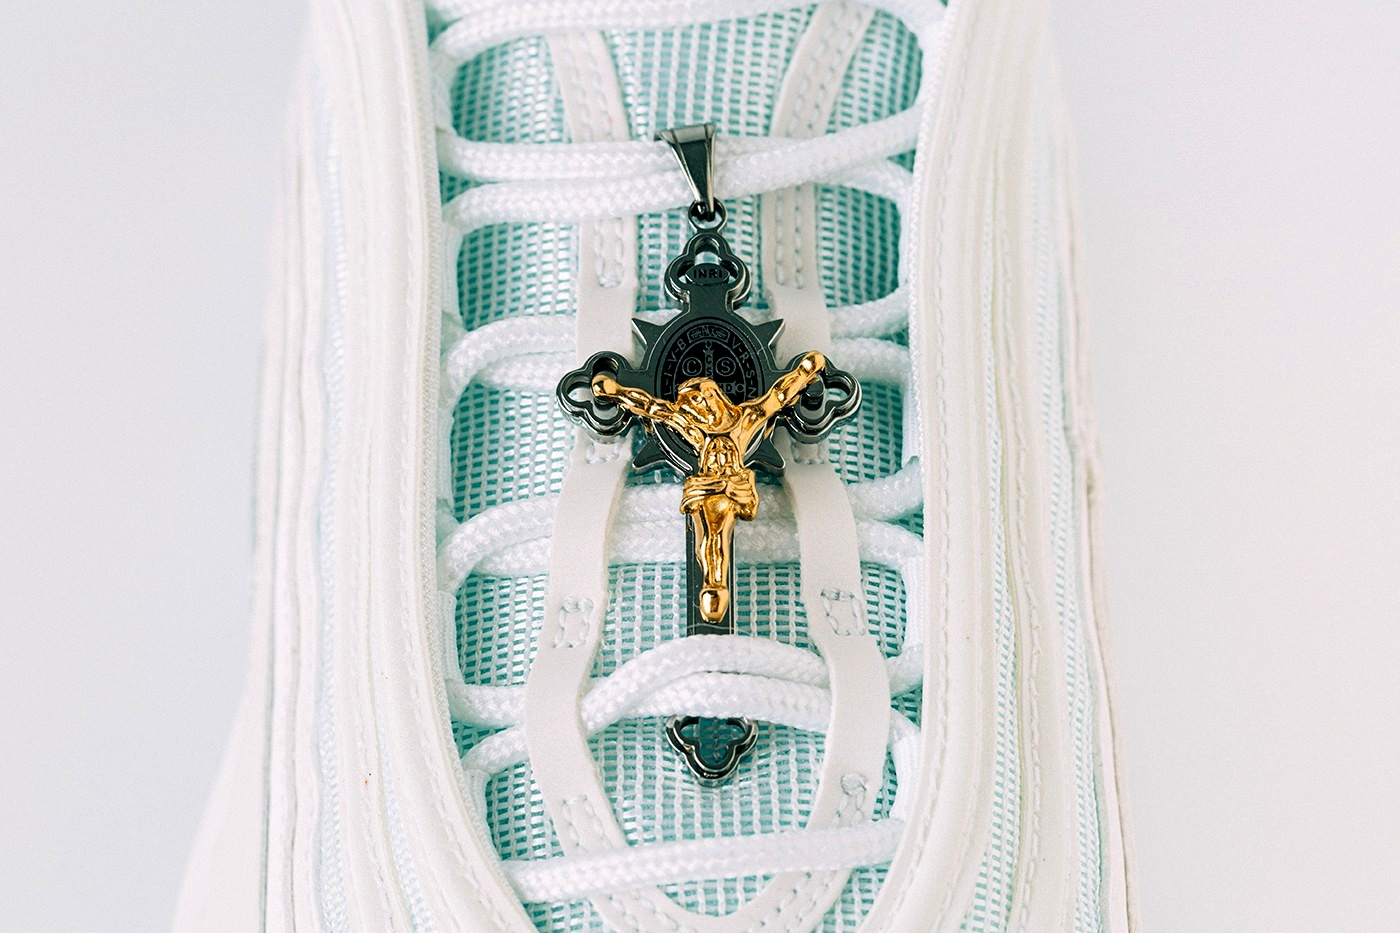 MSCHF x INRI Nike Air Max 97 Jesus Shoes